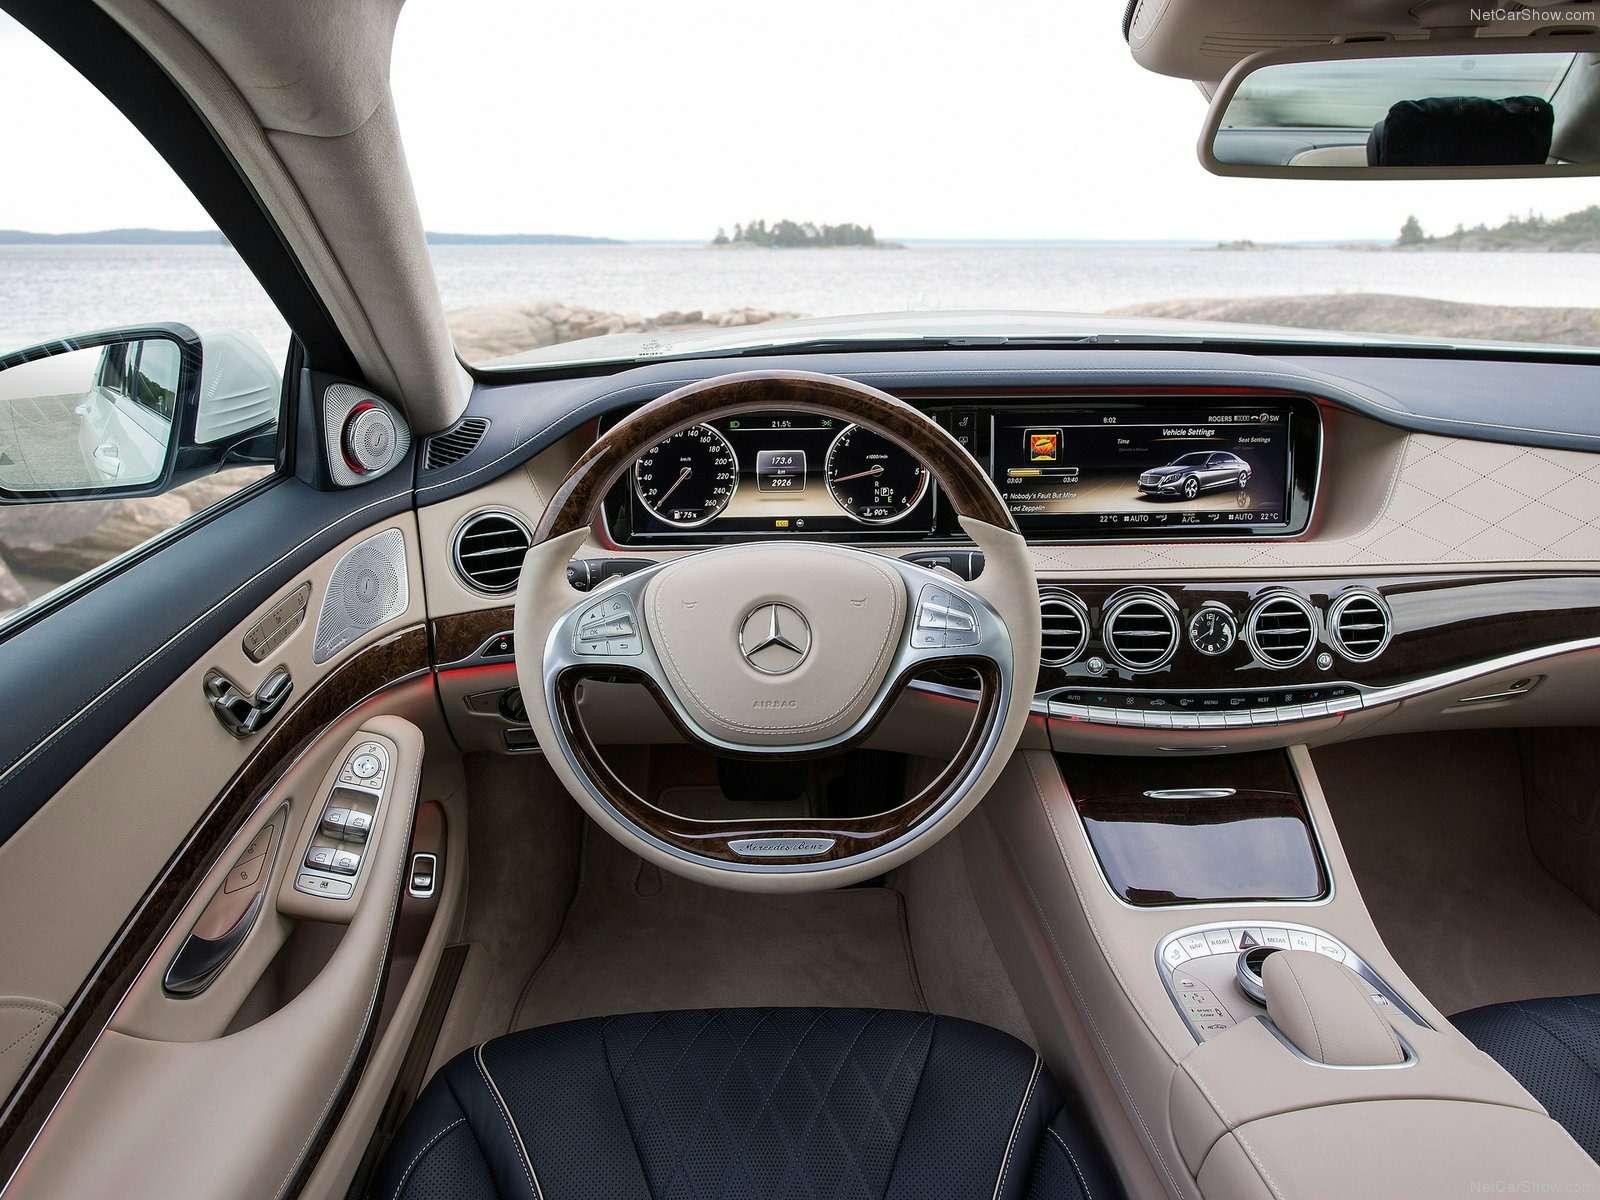 03Mercedes S-Class interior